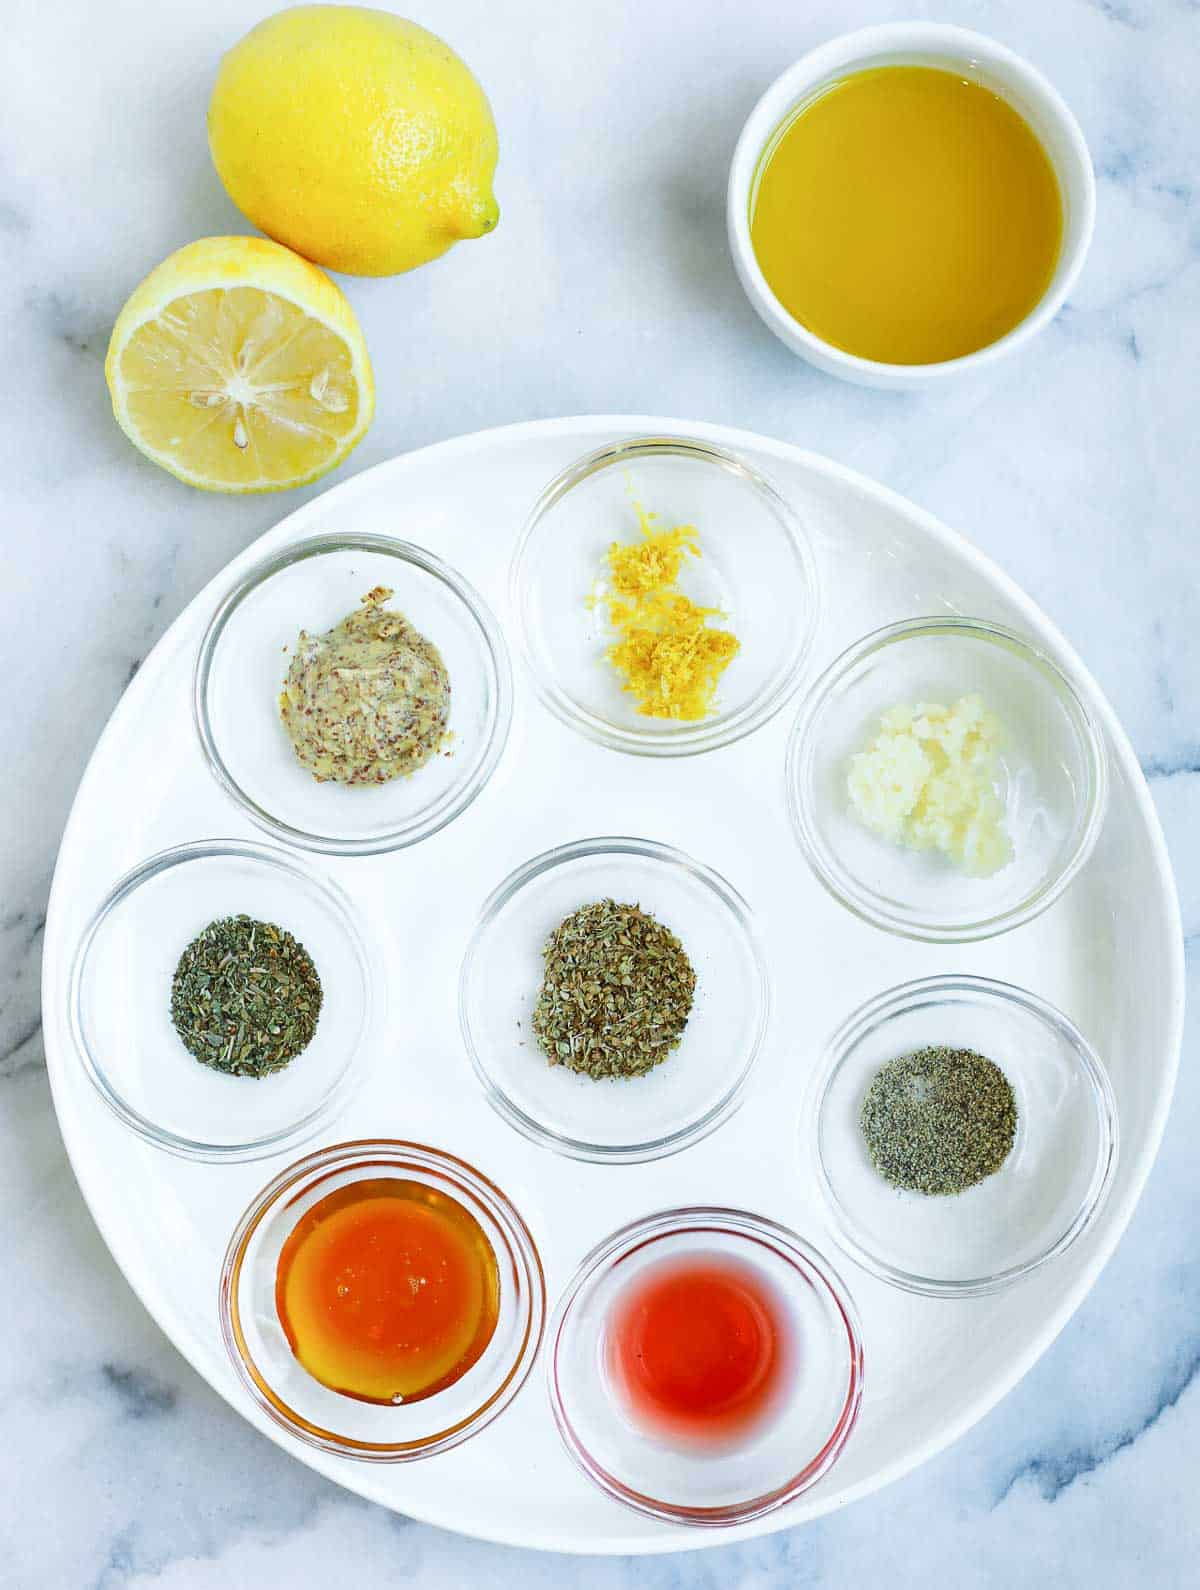 Ingredients for a lemon herb dressing.